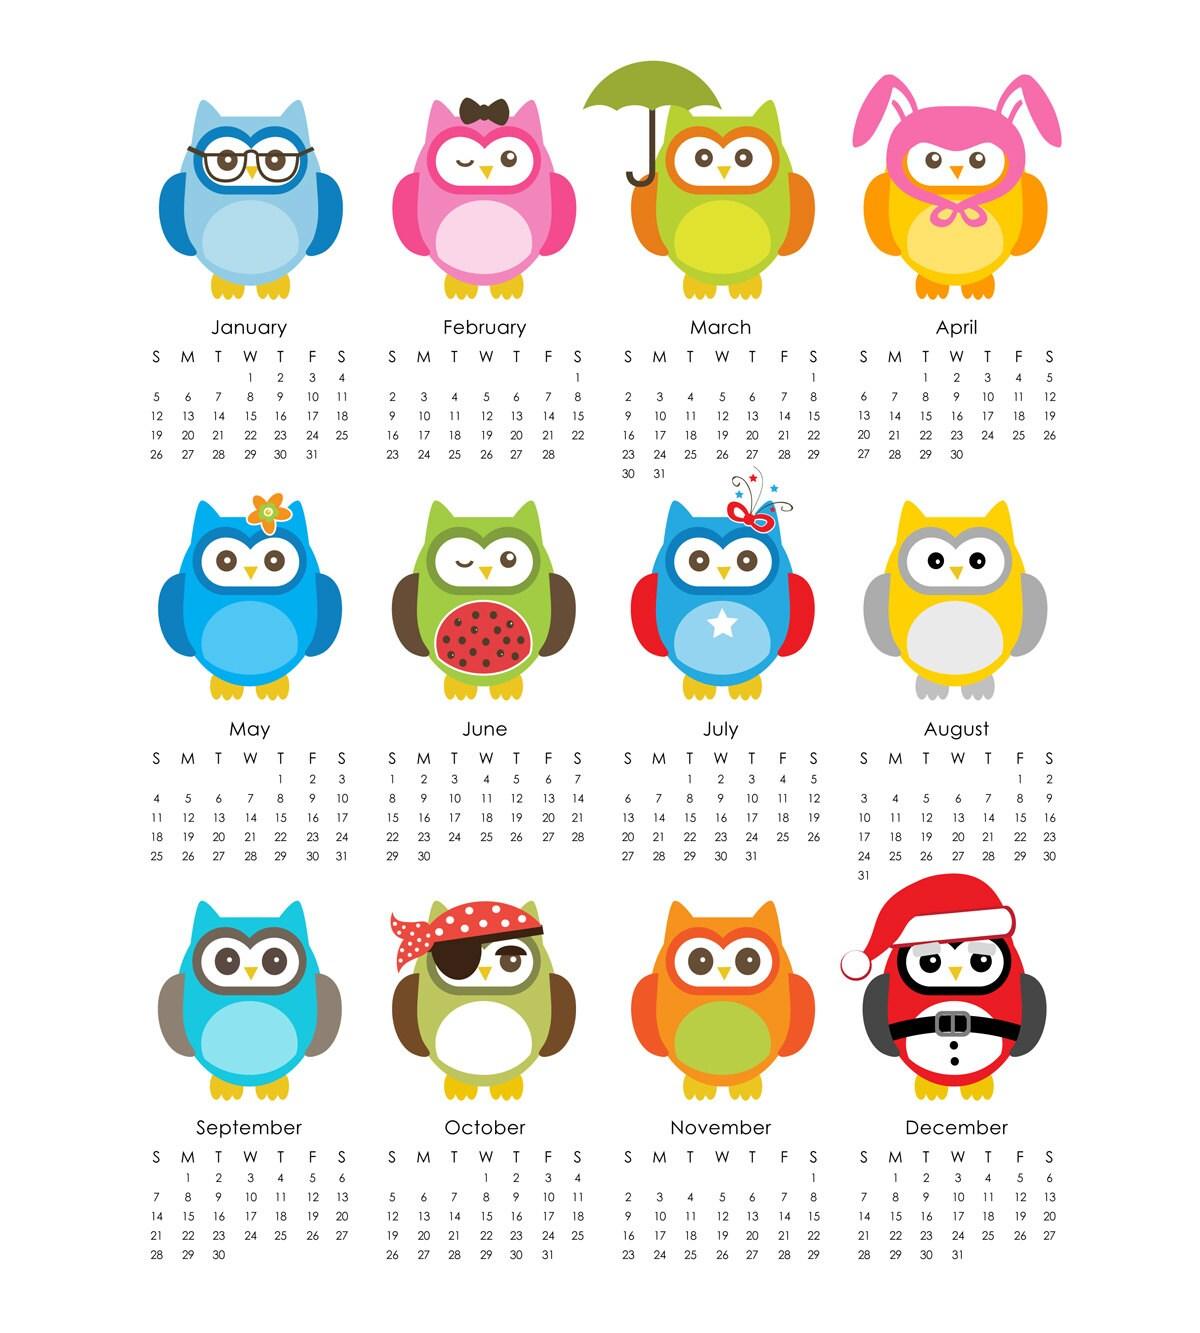 Owls 2014 Calendar printable 8x10 sheet DIY